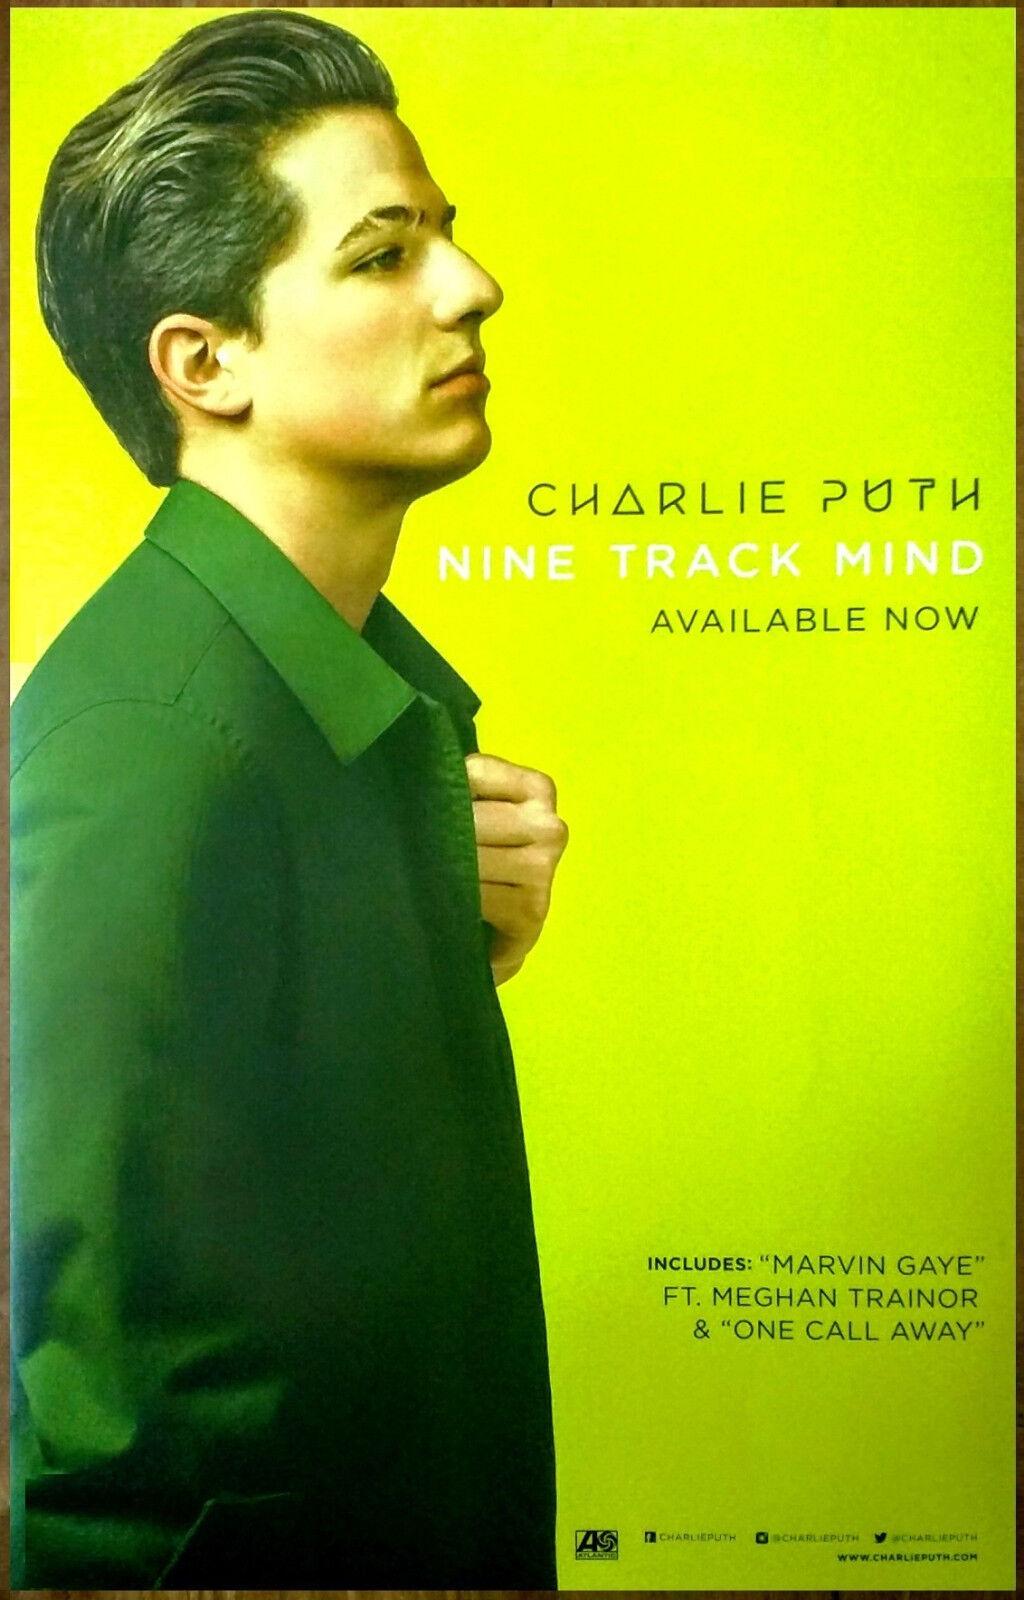 Charlie puth nine track mind 2016 ltd ed rare new poster +free pop r&b poster!